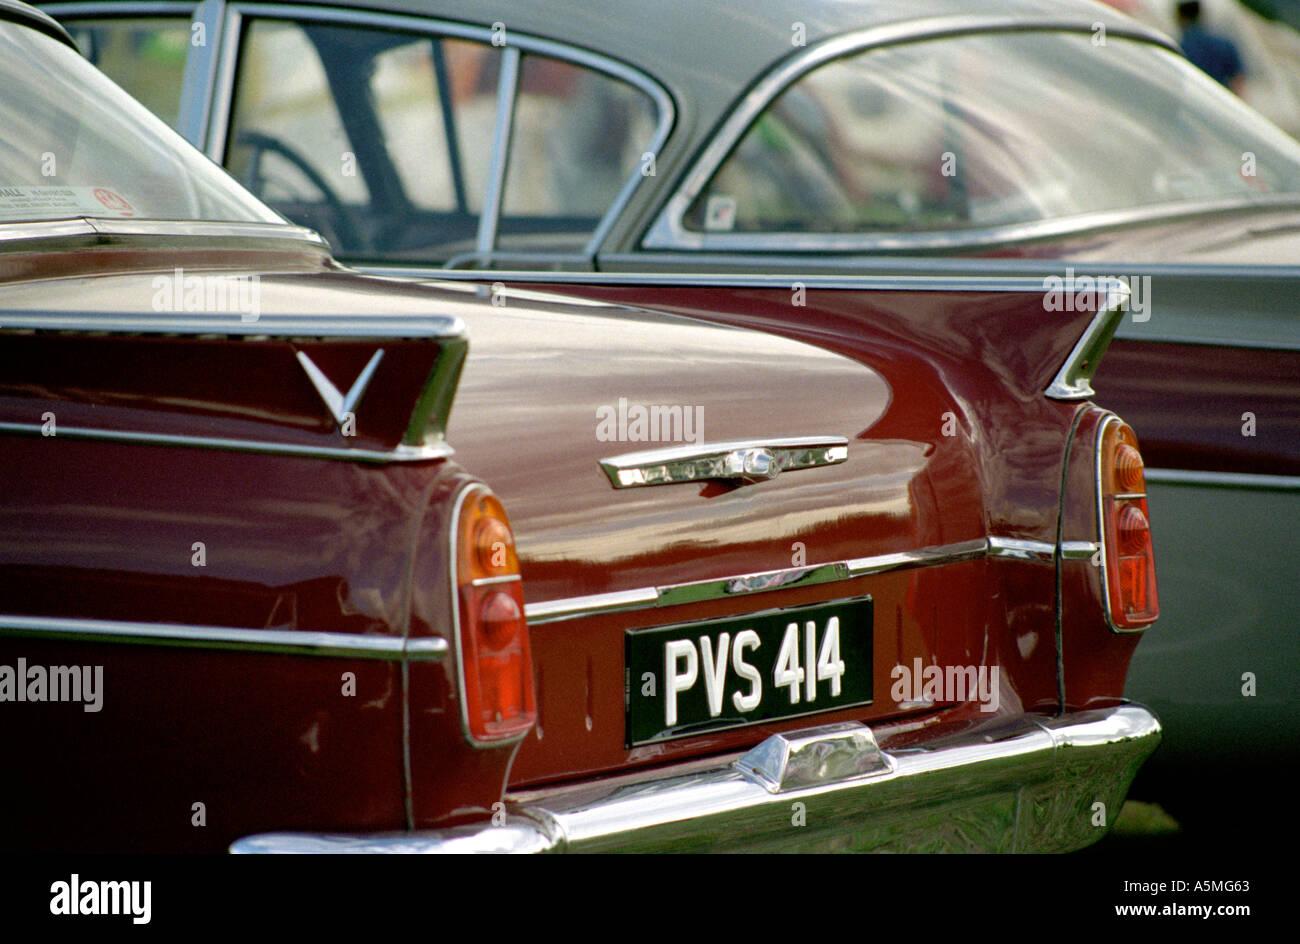 UK Classic and veteran car show, Vauxhall detail - Stock Image